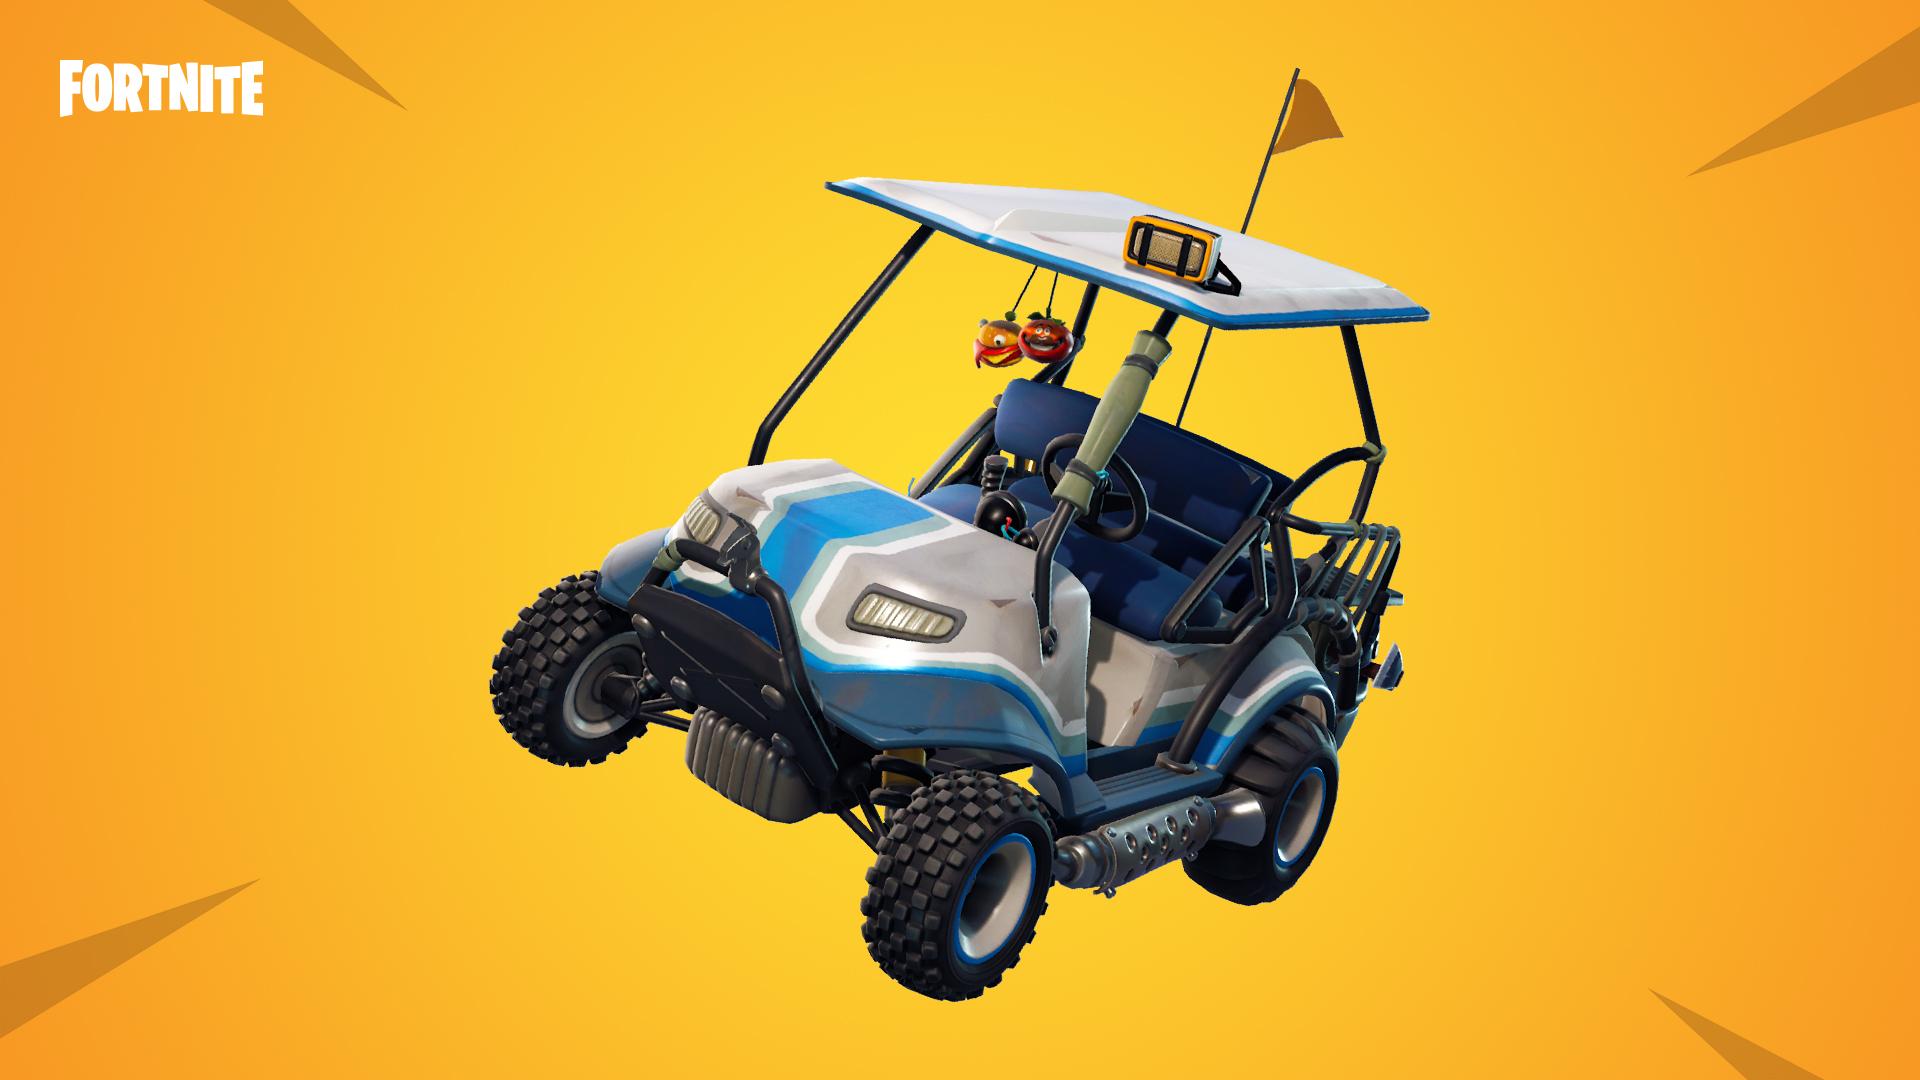 Fortnite_patch-notes_v5-0_BR05_Social_Launch_Golf-Cart-1920x1080-8d4541a50fbbdd3e8cdda1df13f7a4346af9c31a.jpg